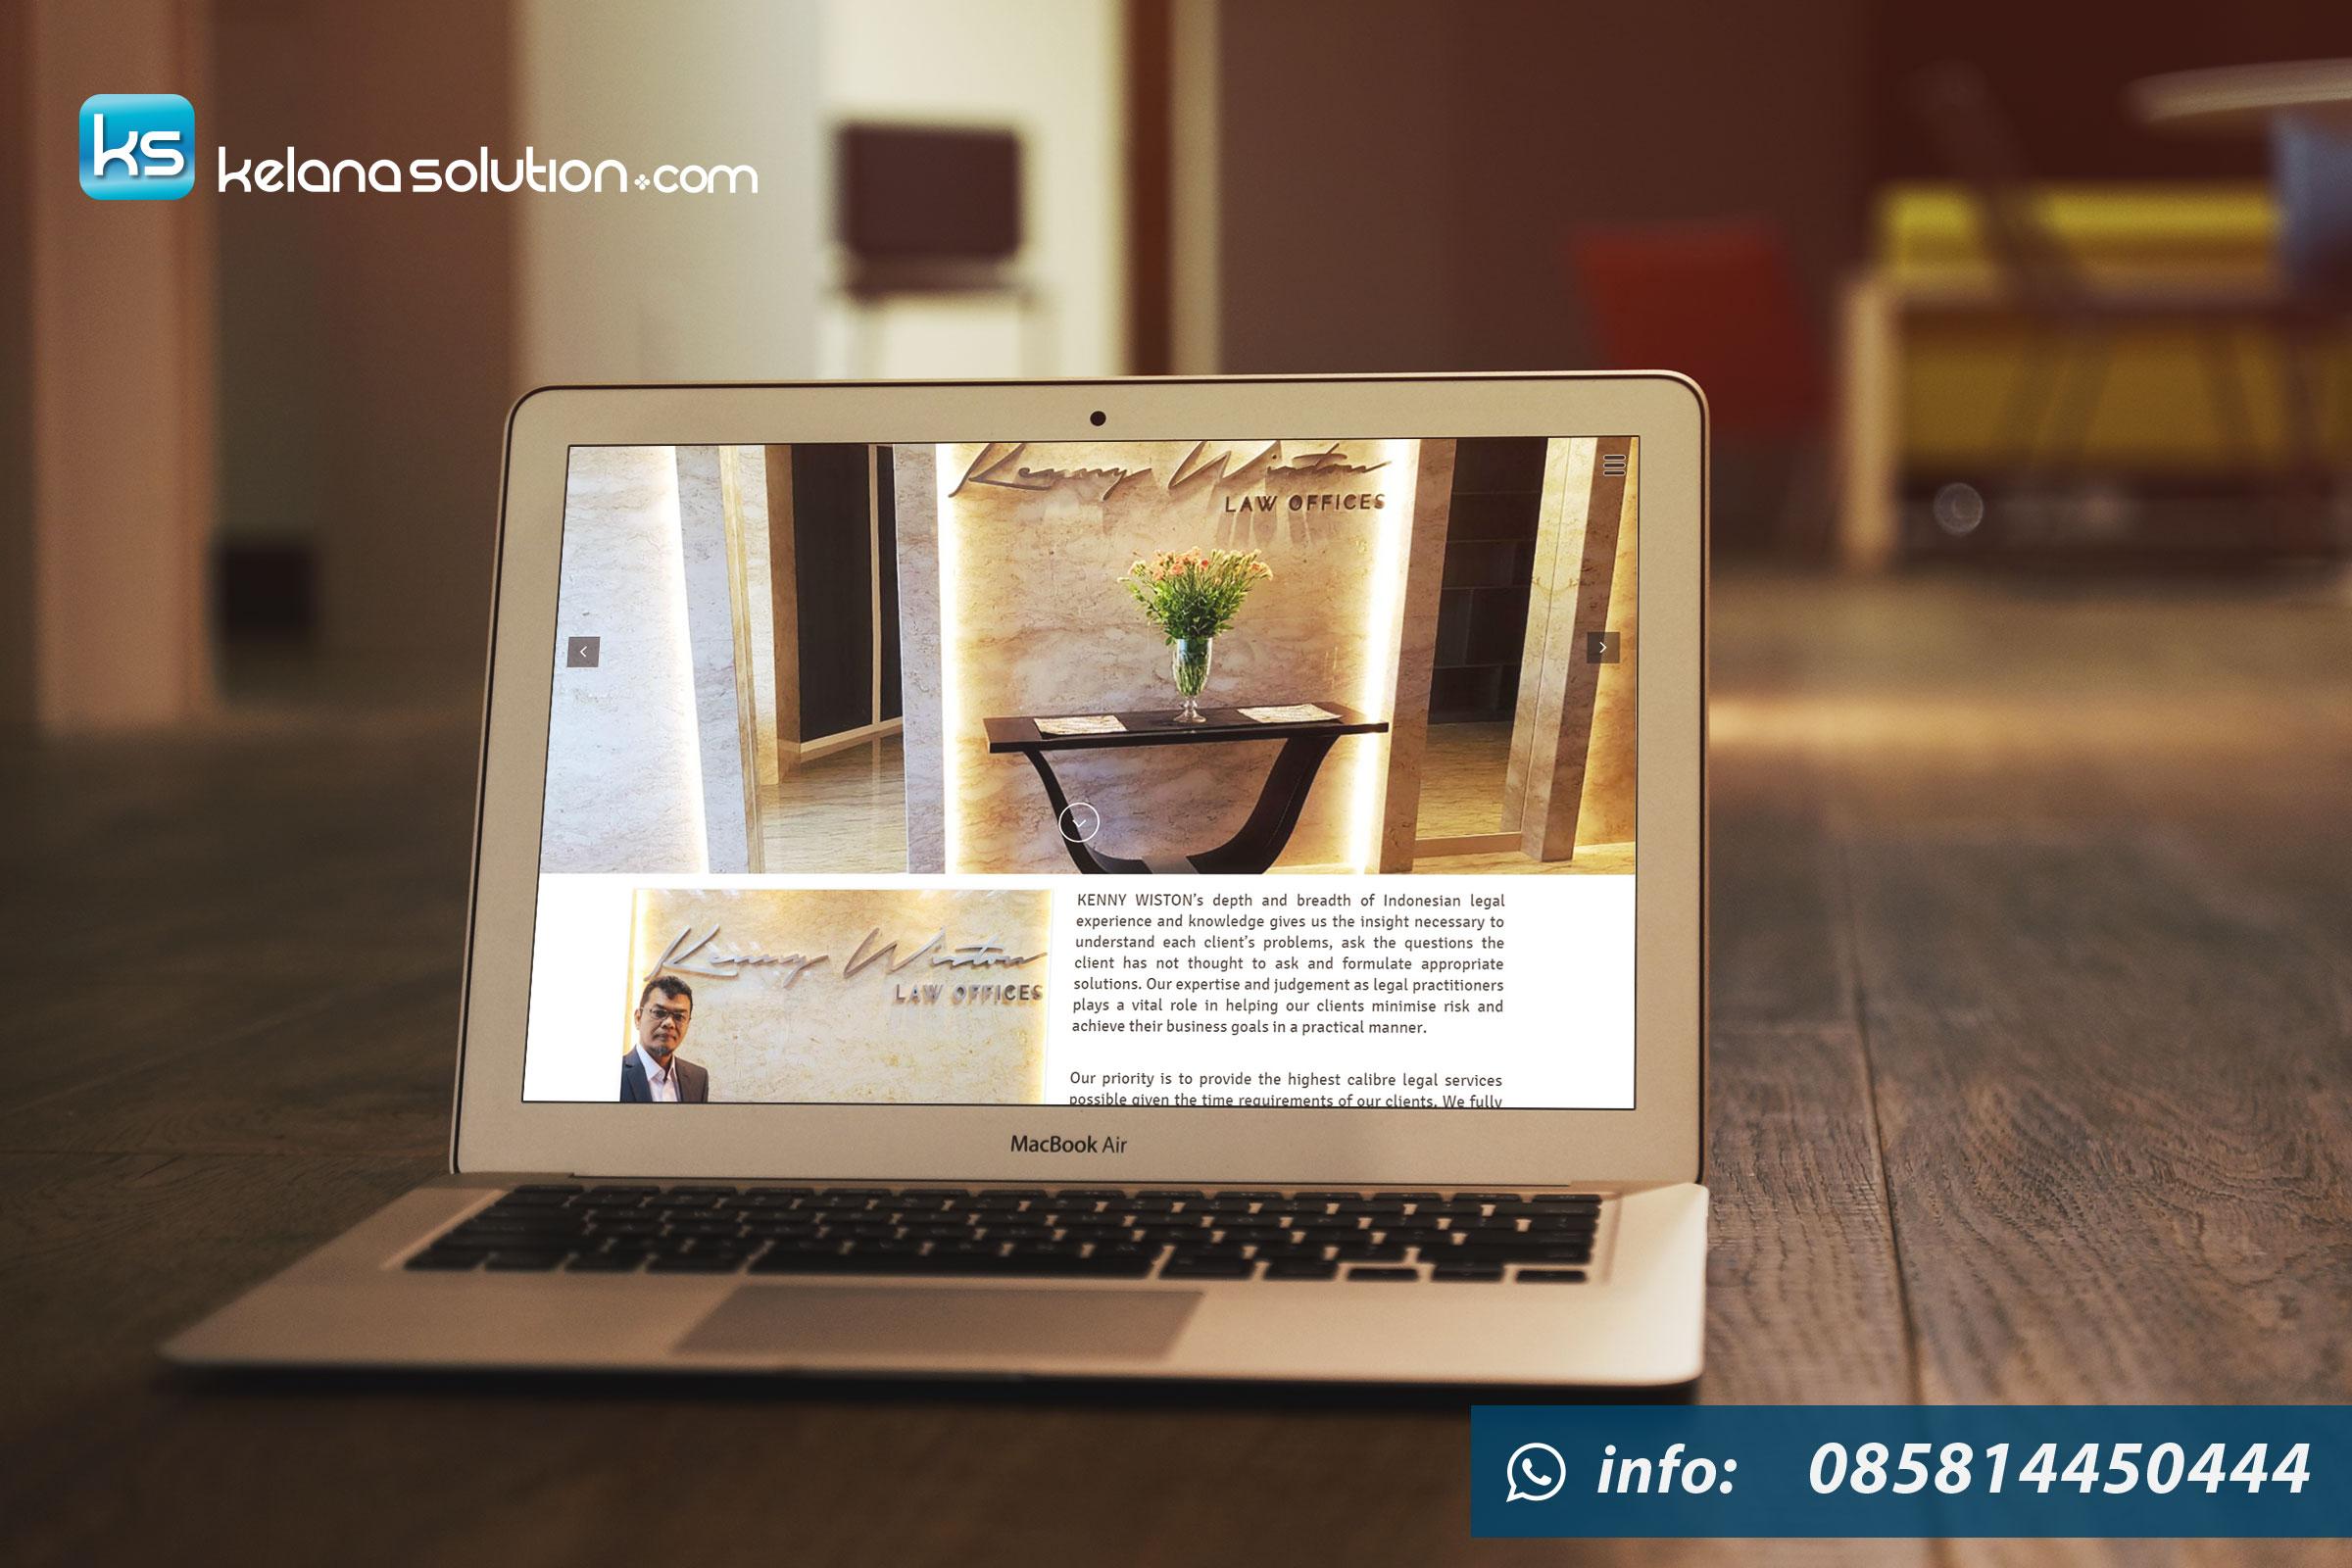 Jasa Pembuatan Website Law Firm, Law Office, Advokat, Lawyer, Pengacara